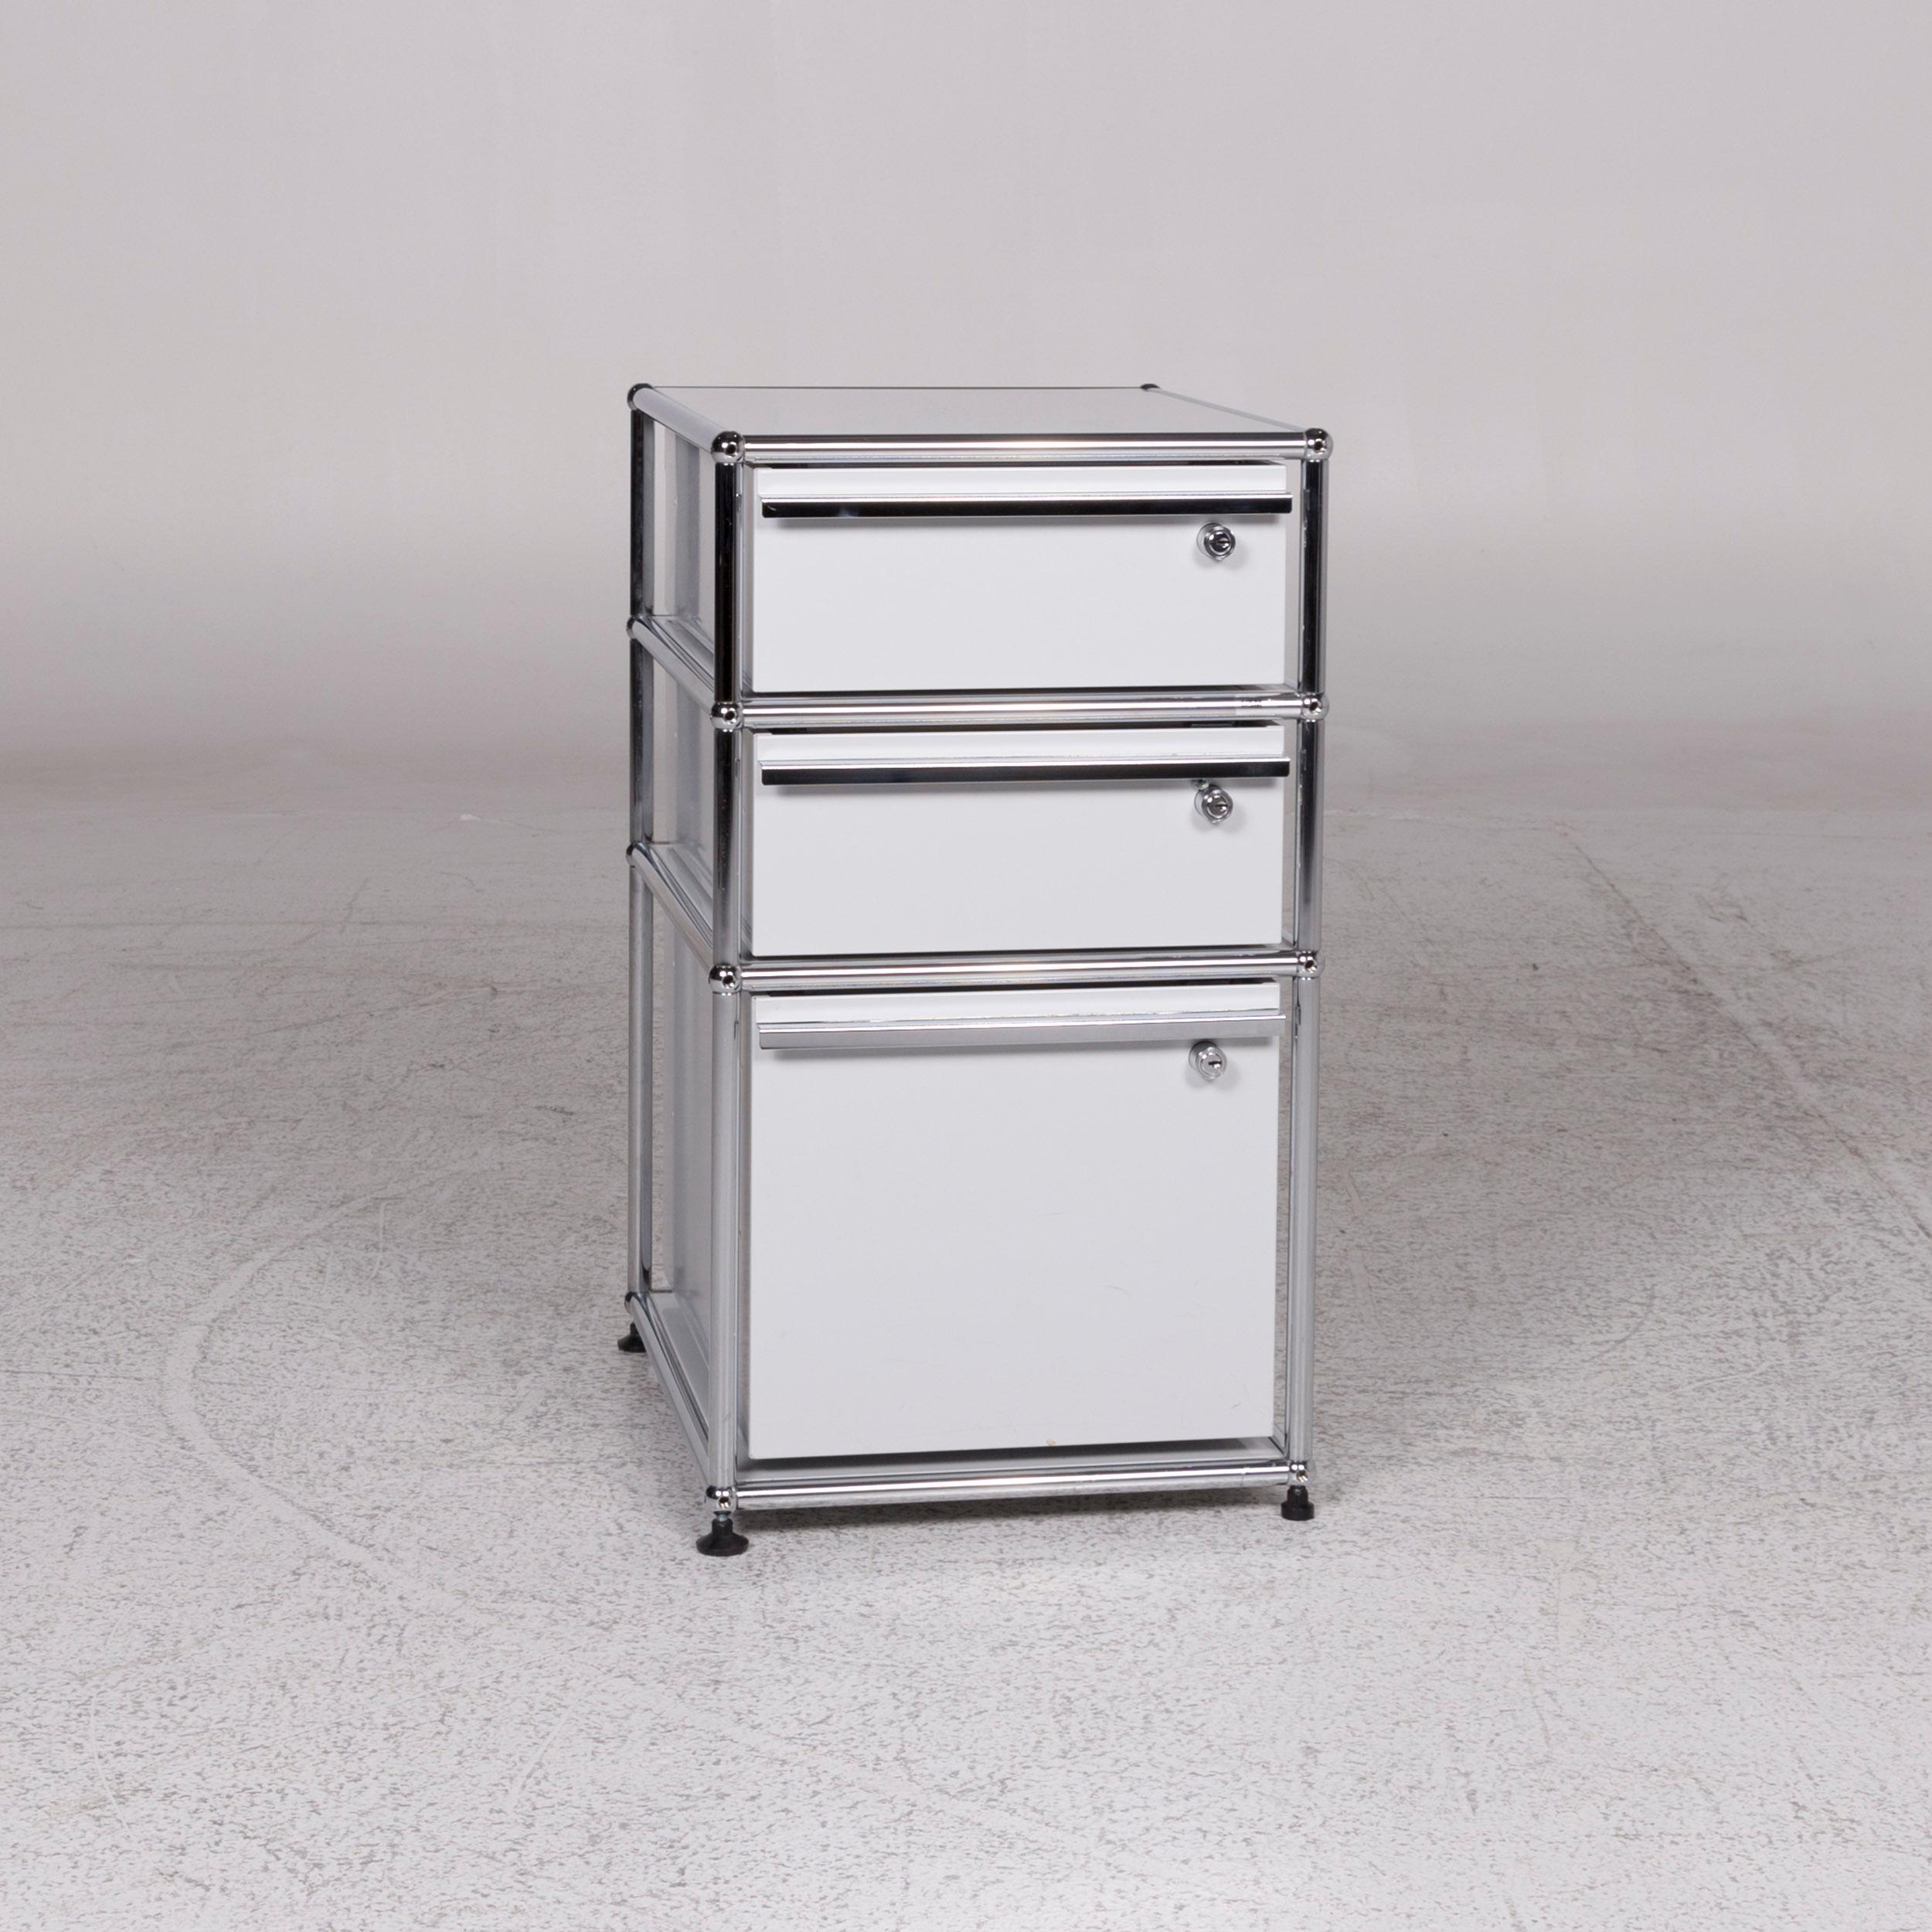 Usm Haller Metal Sideboard Set Light Gray With Three Drawers Chrome